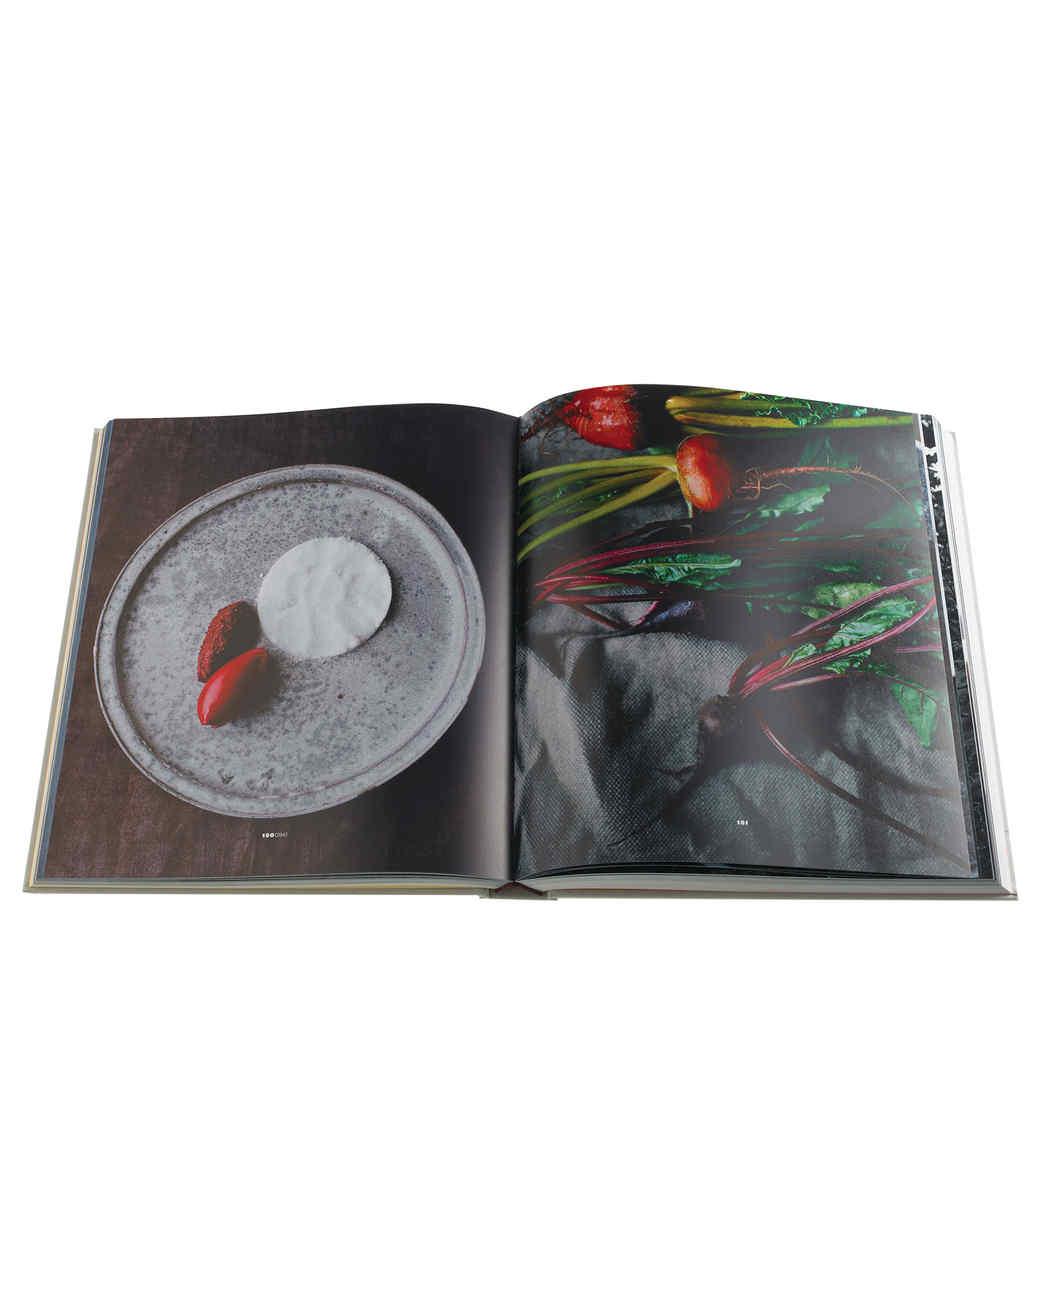 mld106502_1210_f_book458.jpg